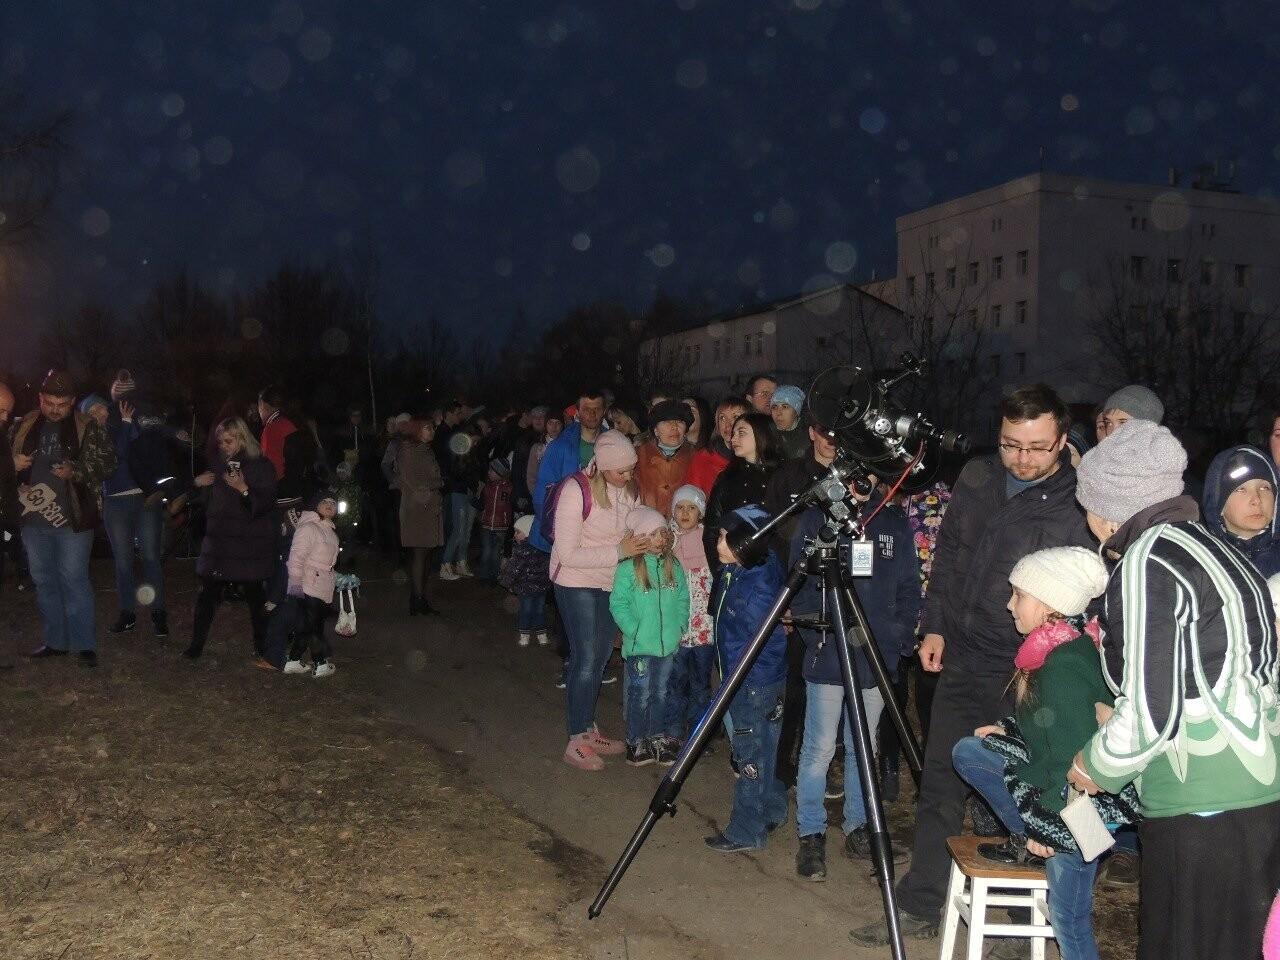 Тамбовчане отметили День космонавтики вместе с порталом Go68 и «Радио Дача», фото-1